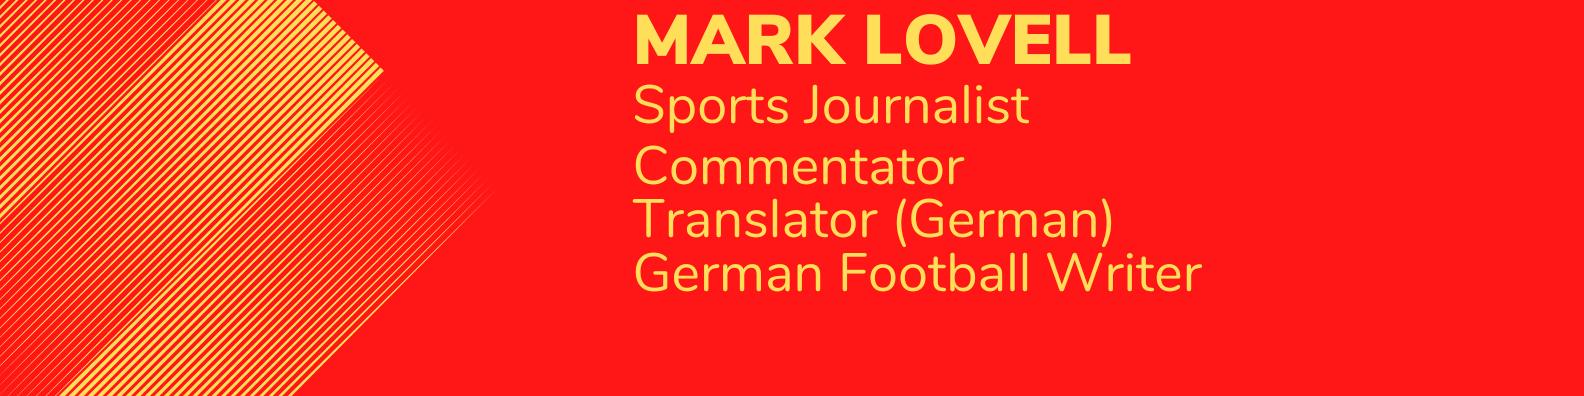 Mark Lovell - UEFA Accredited Journalist